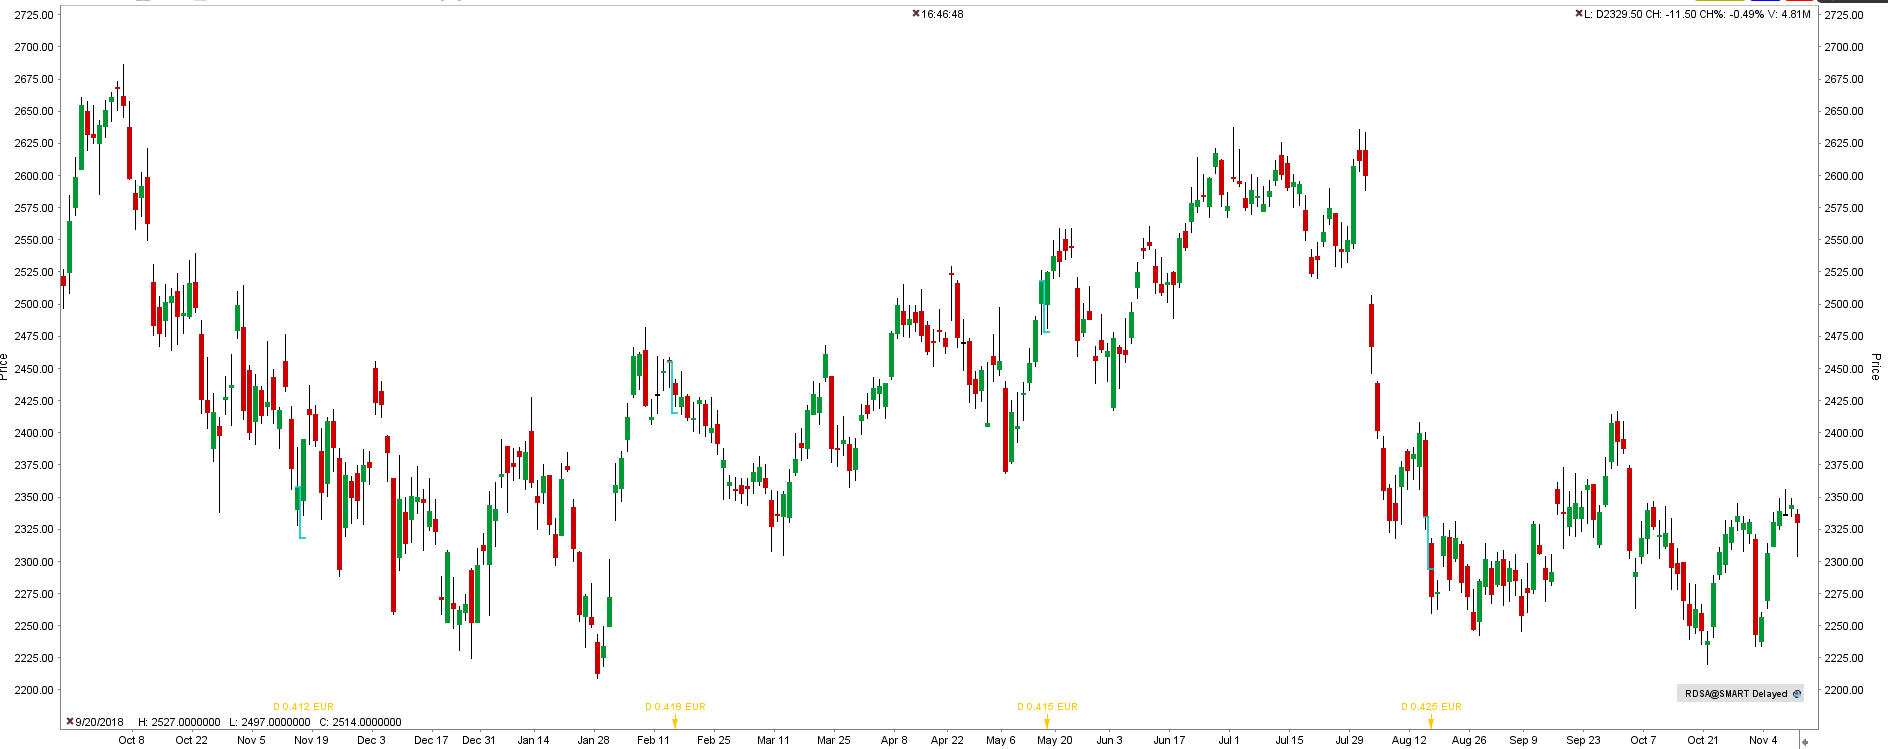 Akcie Royal Dutch Shell (RDSA) - graf